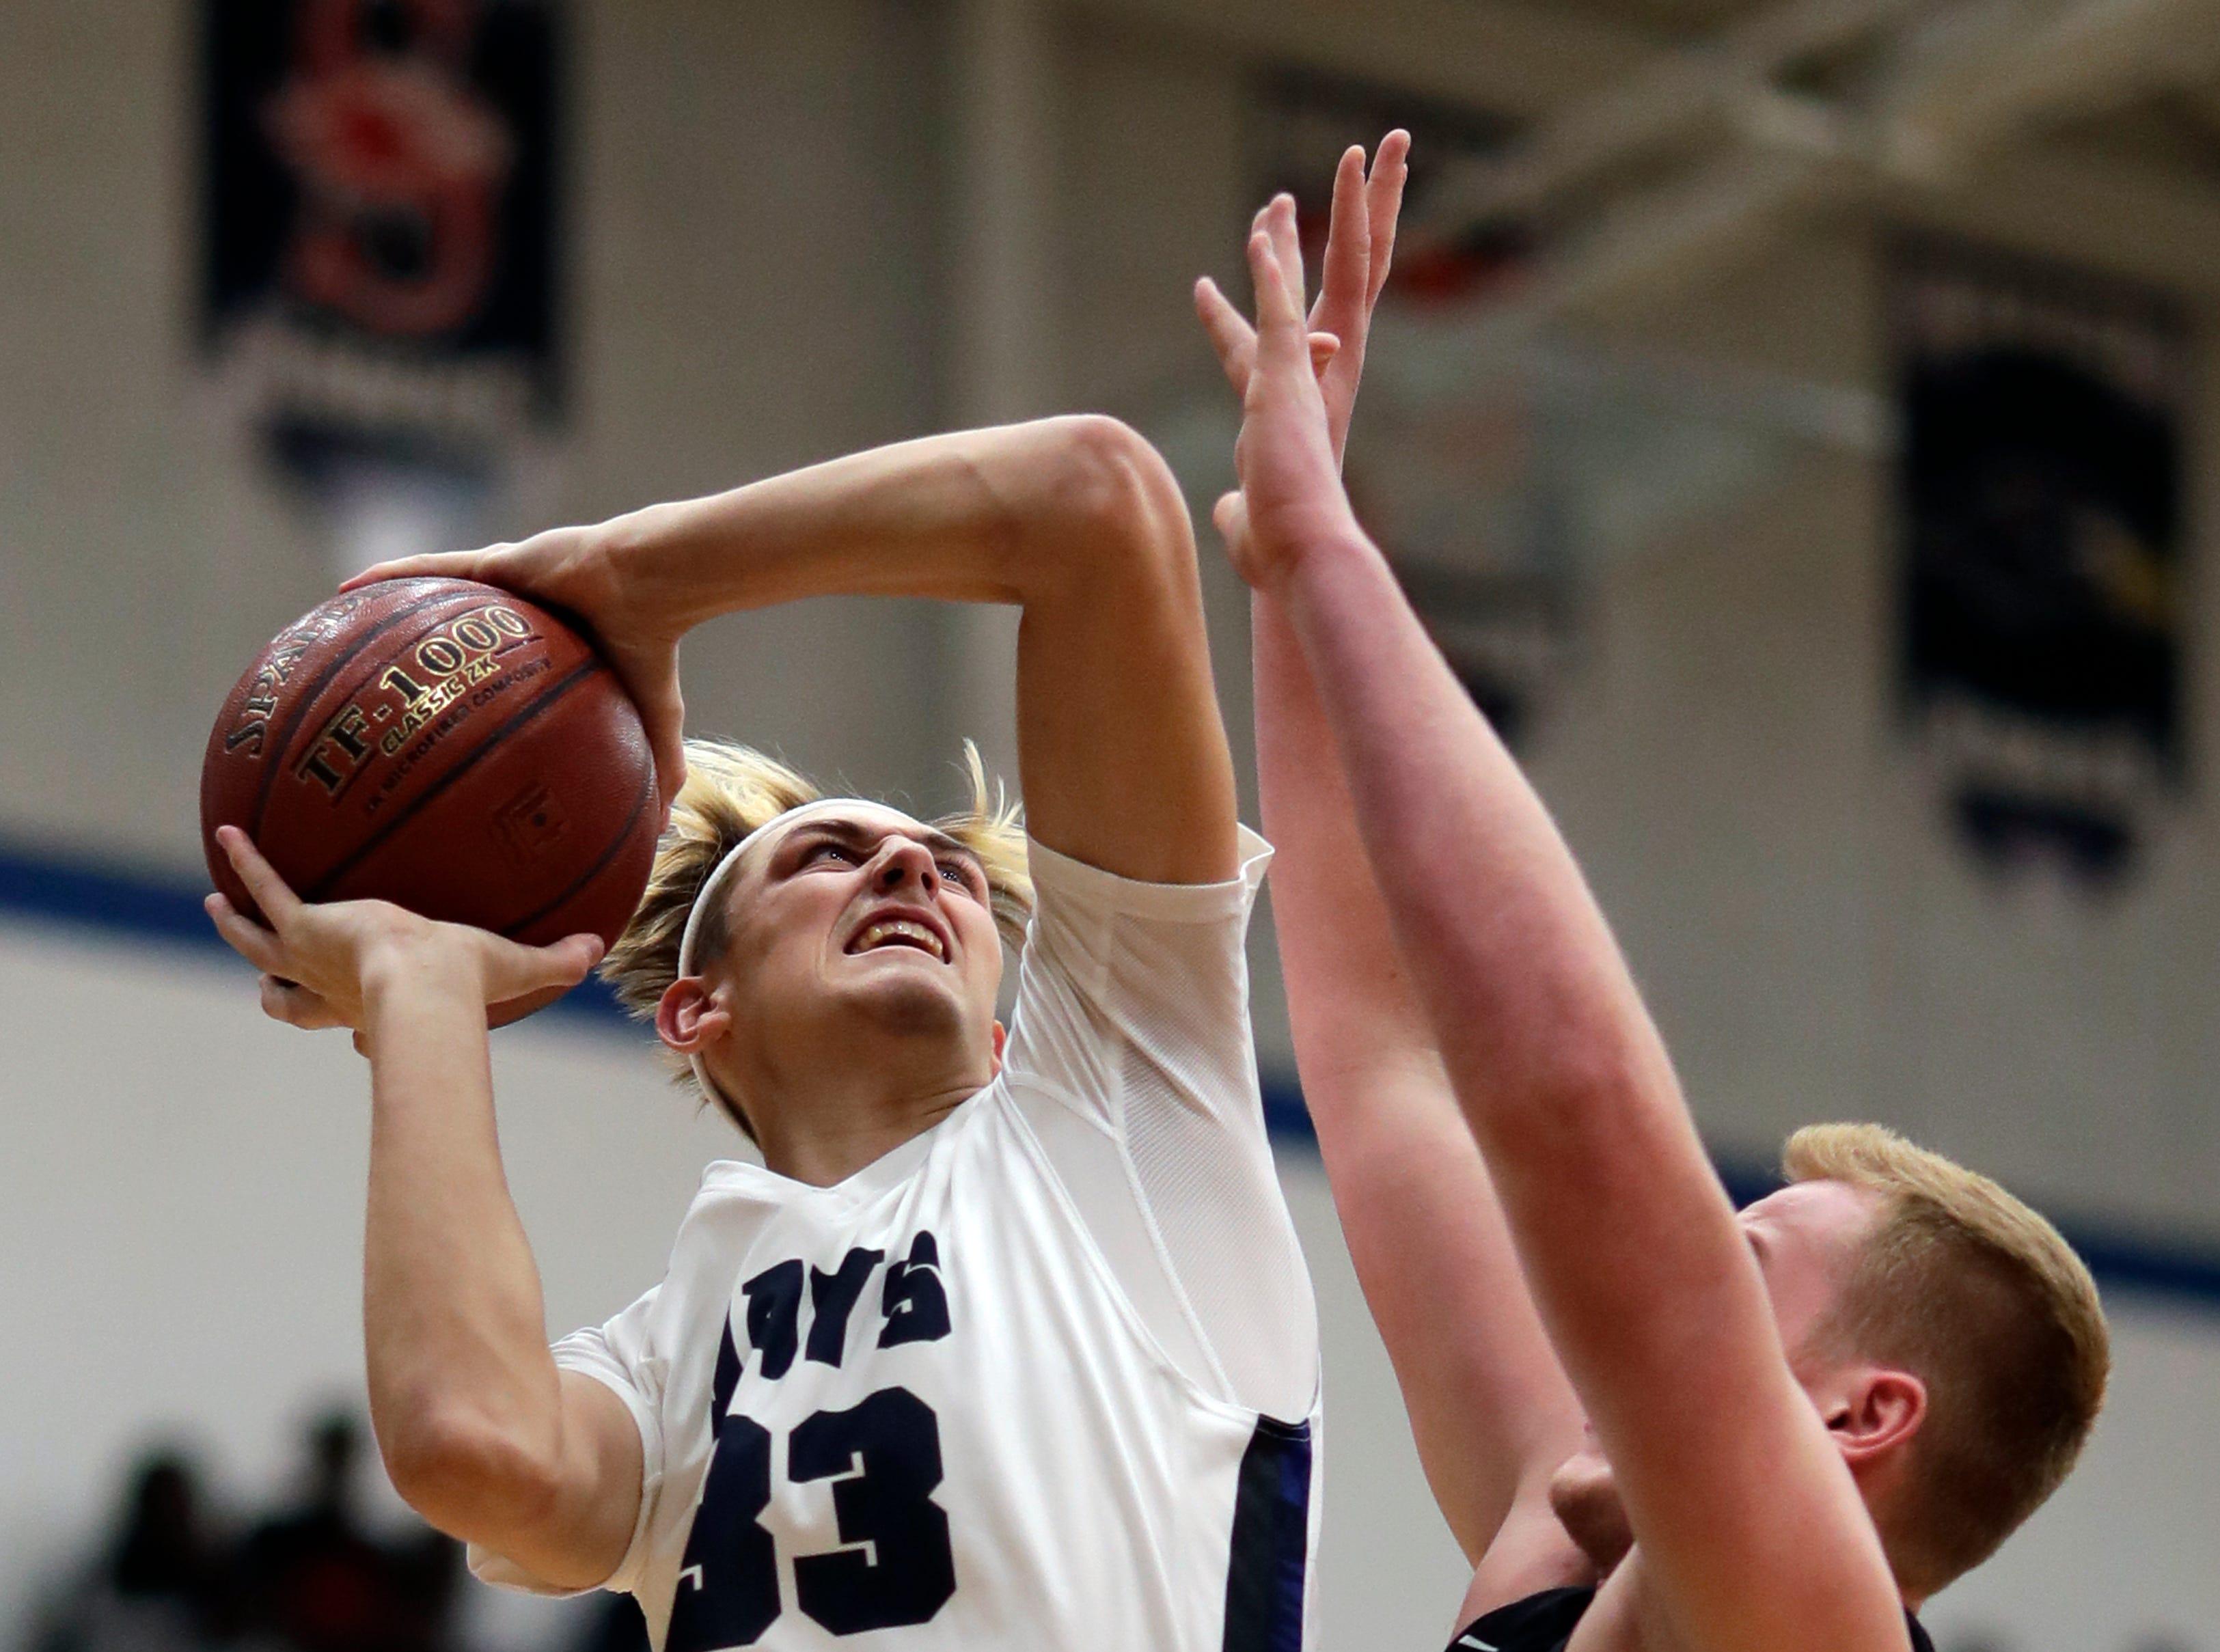 Menasha High School's Ben Romnek (33) puts up a shot against West De Pere High School's Jacob Karchinski (32) during their boys basketball game Tuesday, December 11, 2018, in Menasha, Wis. Dan Powers/USA TODAY NETWORK-Wisconsin